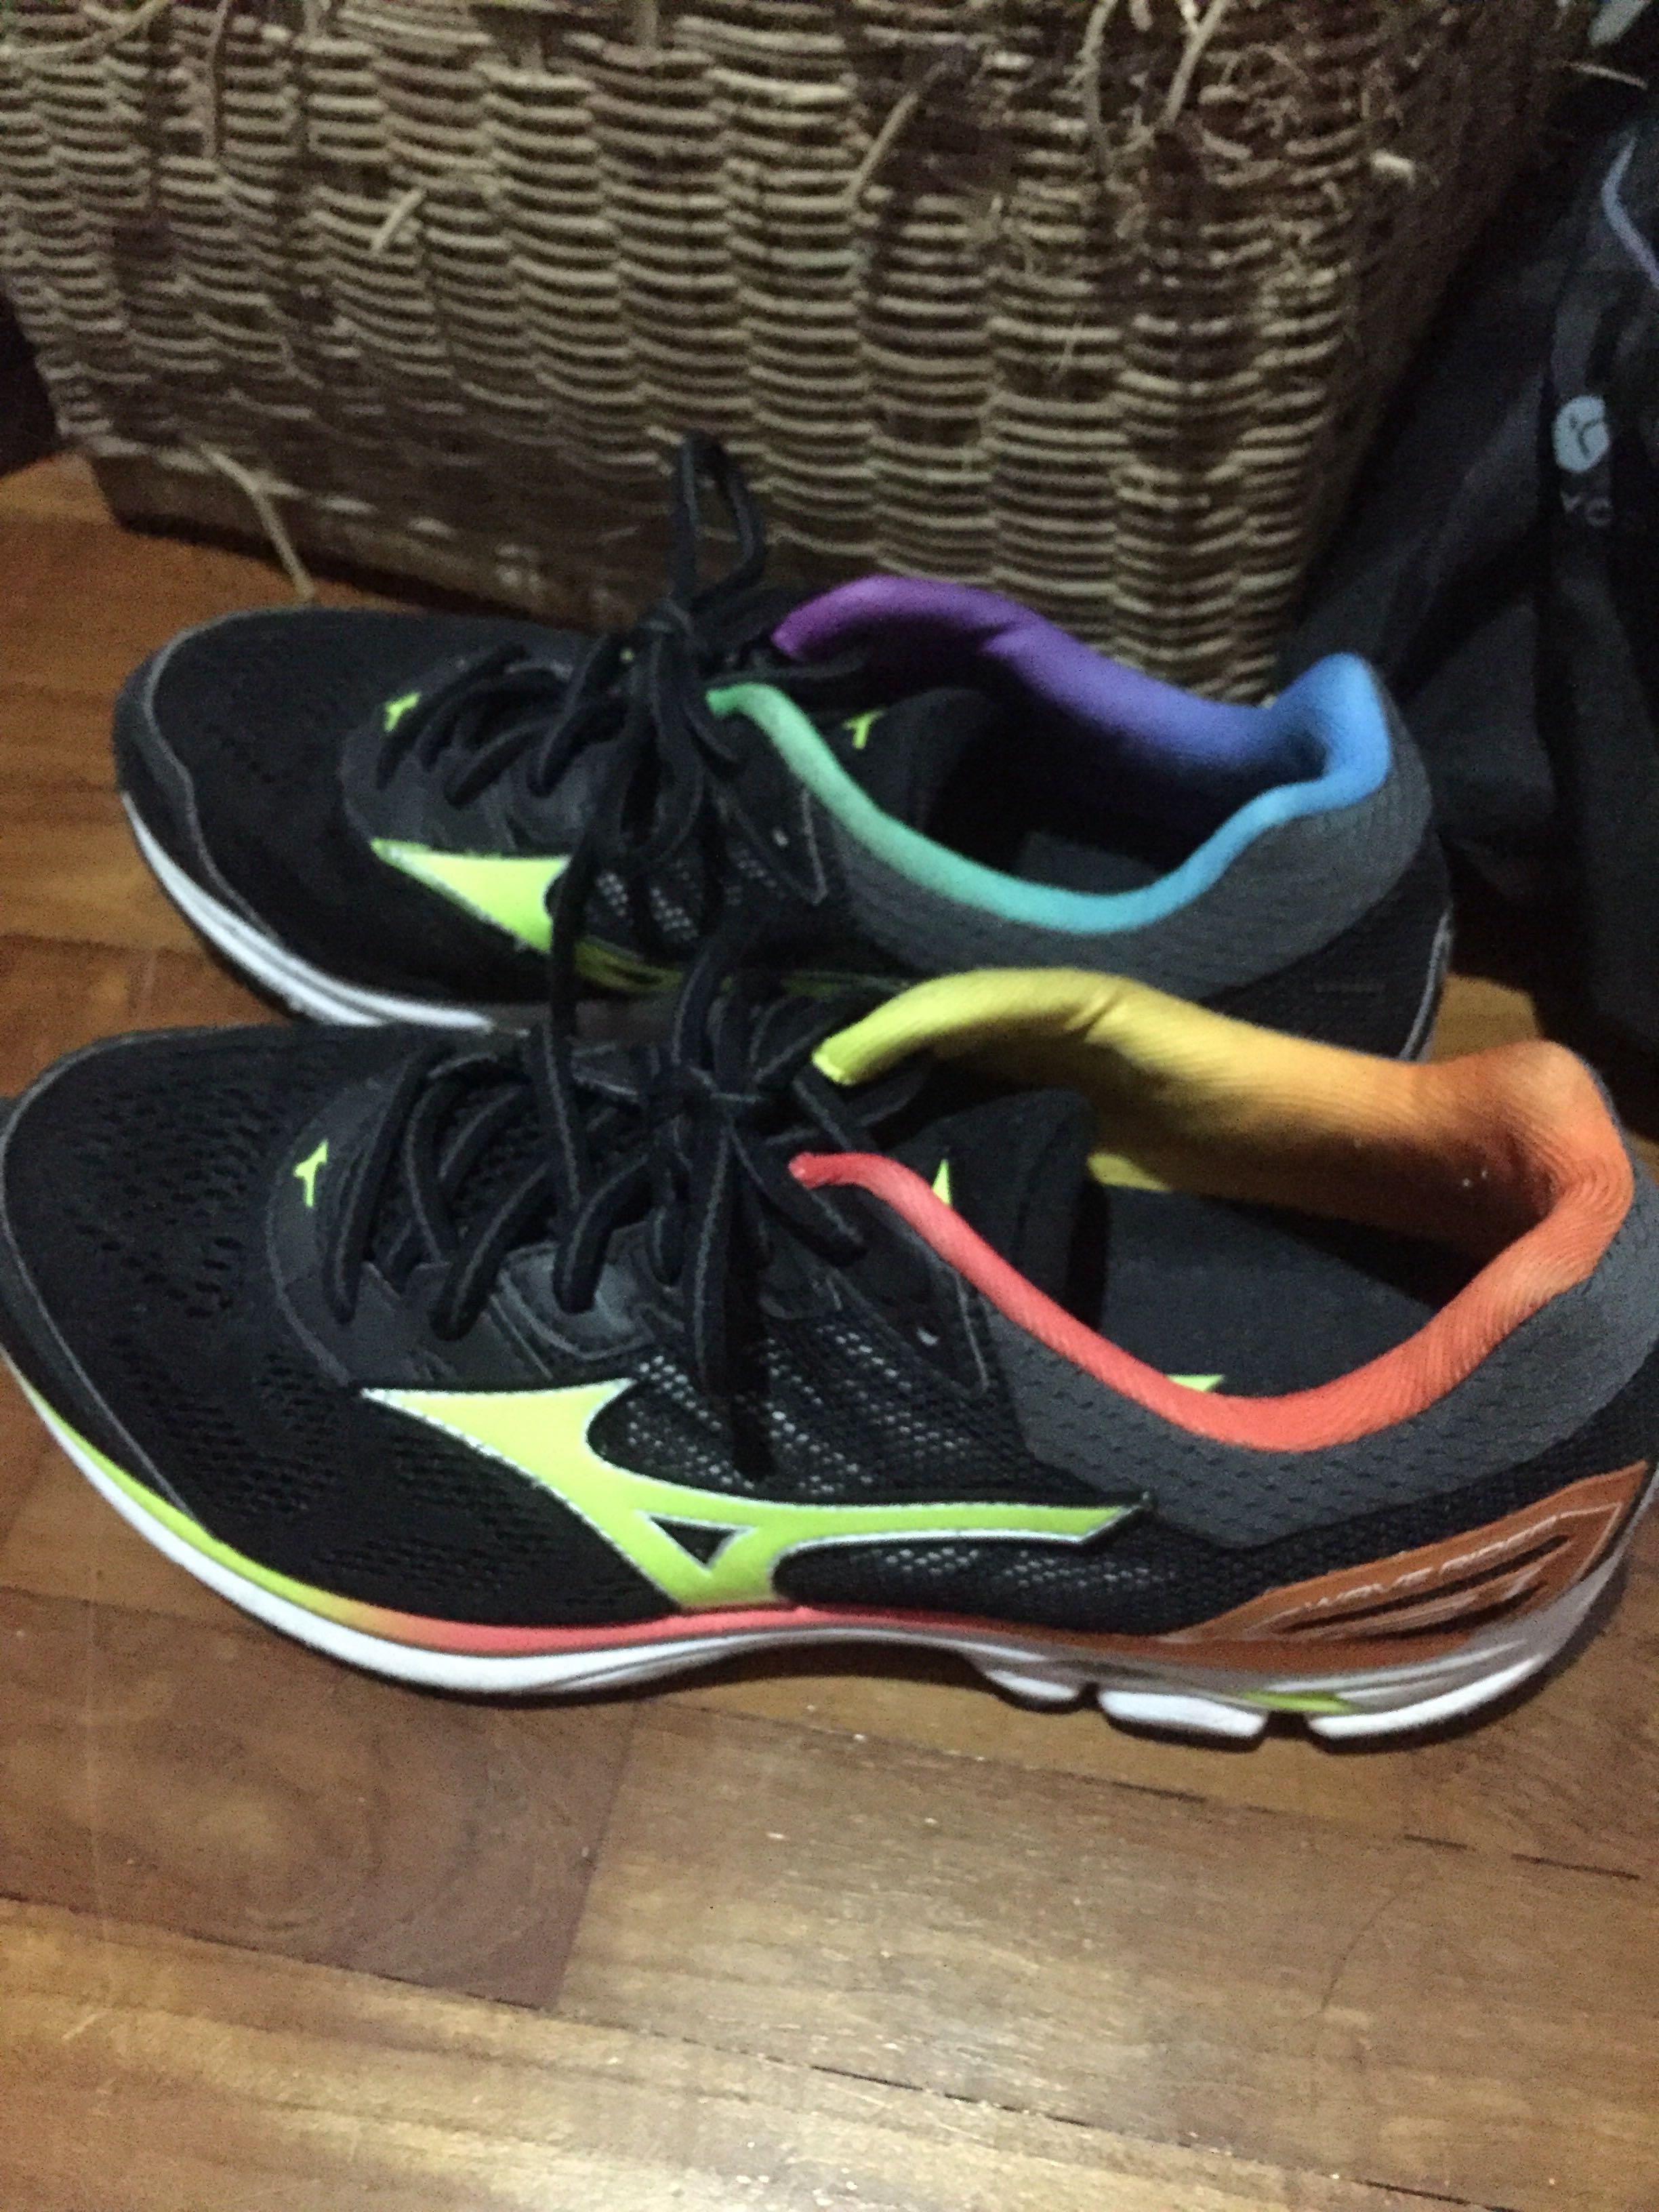 mizuno wave rider 21 osaka marathon limited editing shoe (sports shoe) 0c974d1eb544a